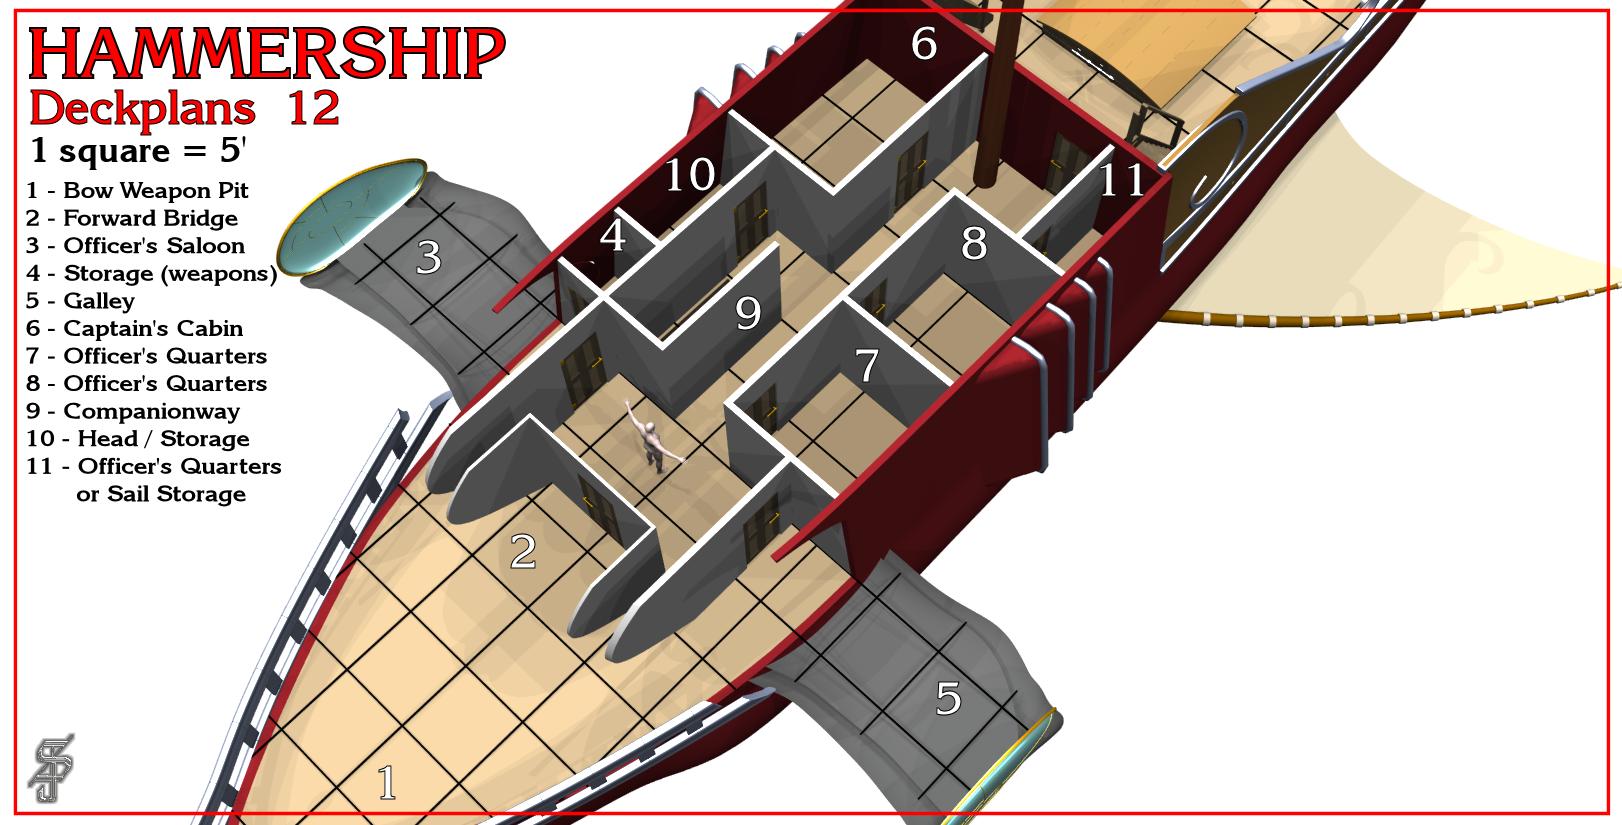 Hammership layout 12